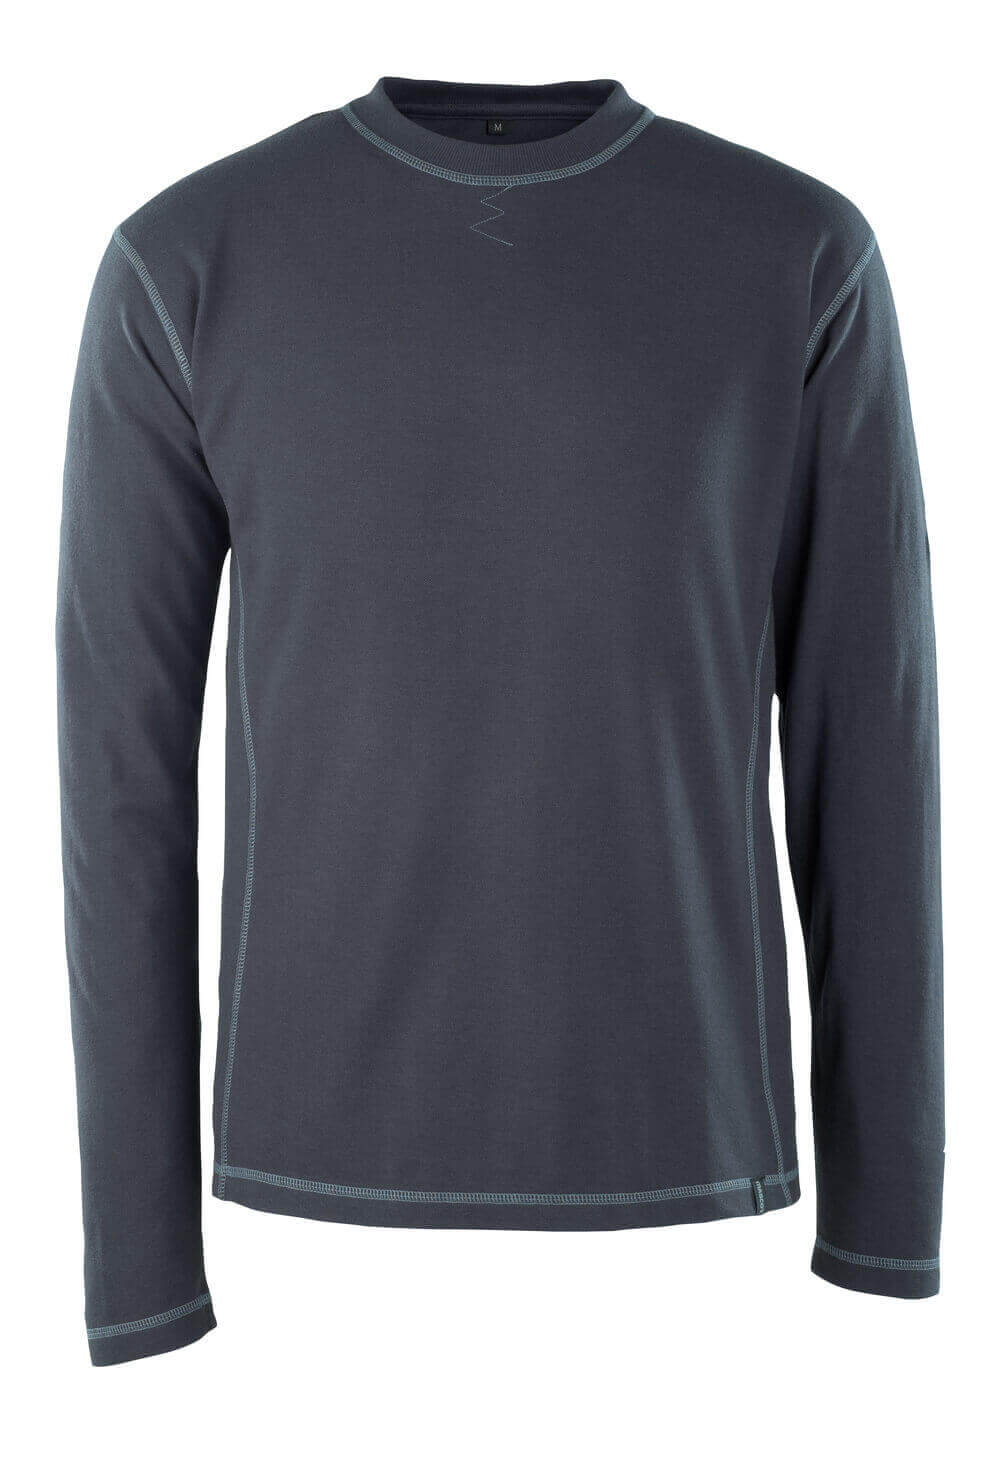 50119-927-010 T-shirt, langærmet - mørk marine